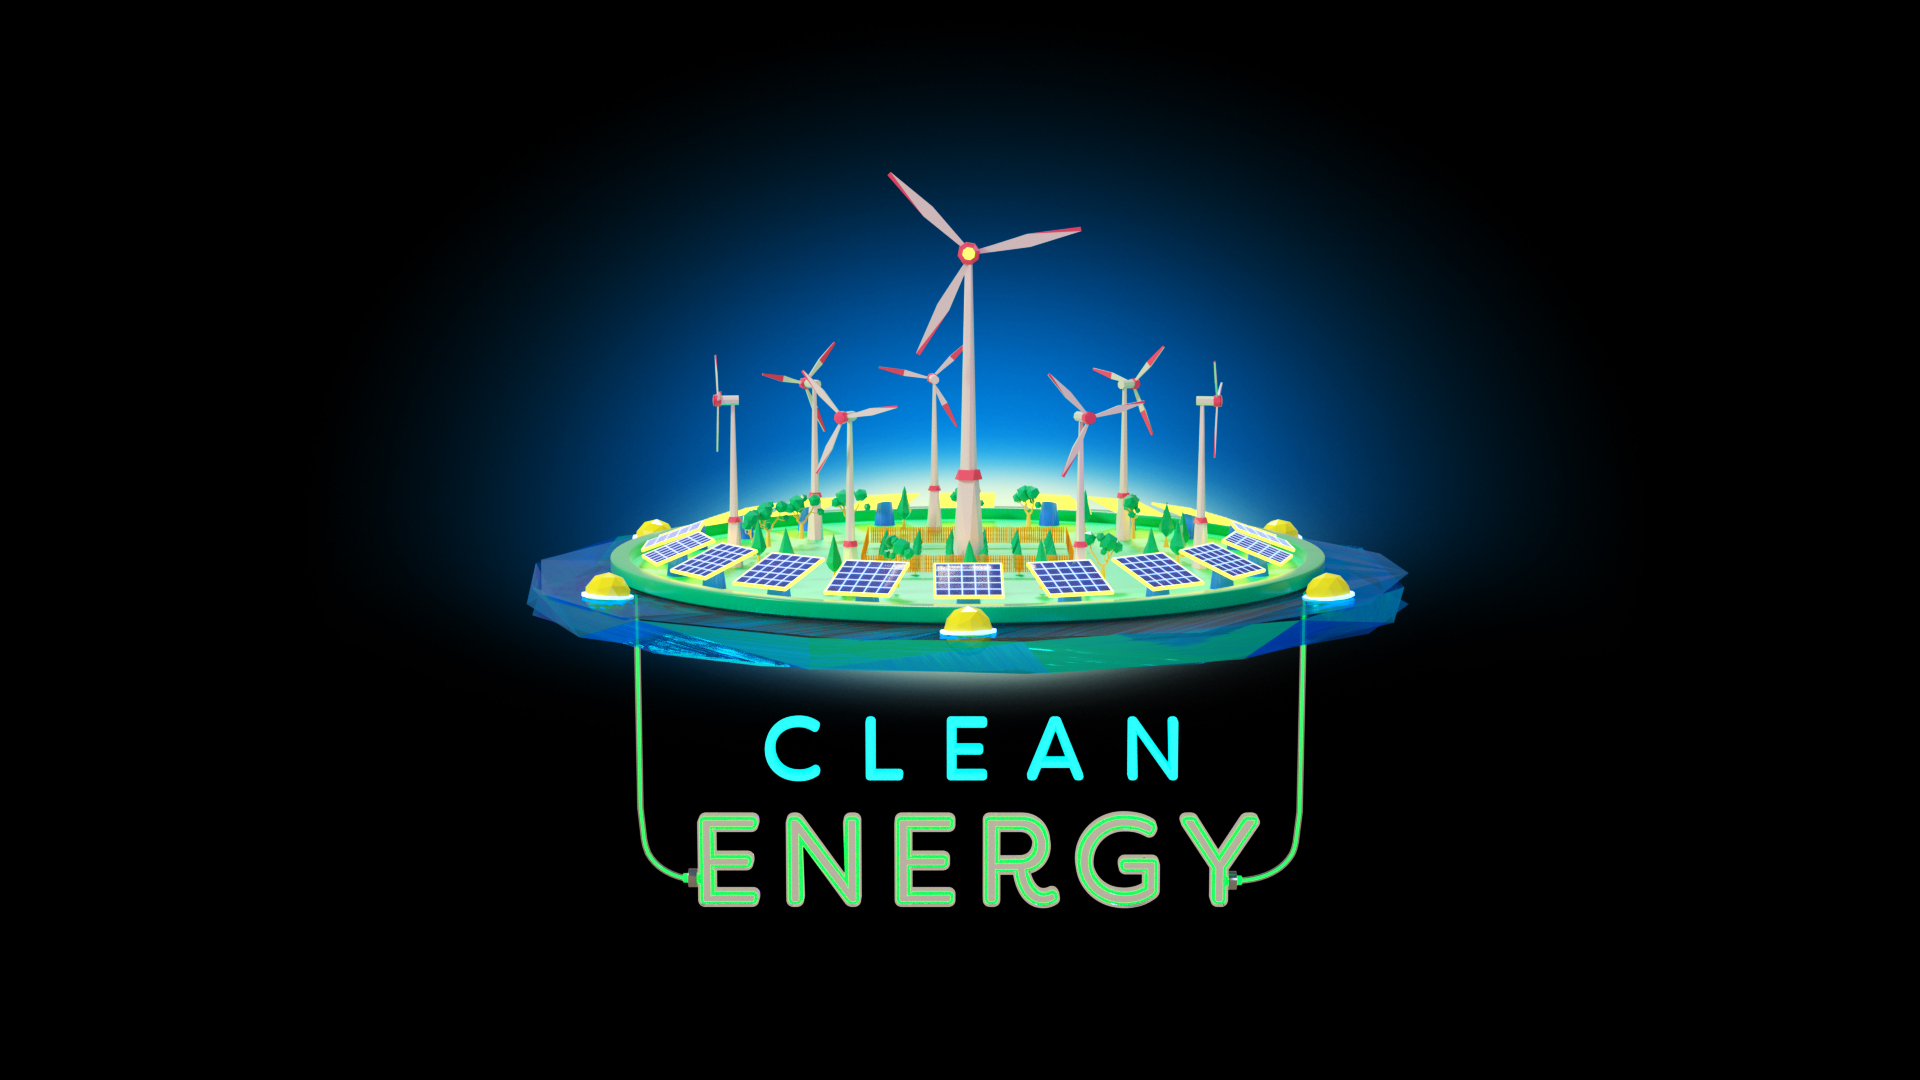 B1_02_CLEAN_ENERGY_TITLE.jpg